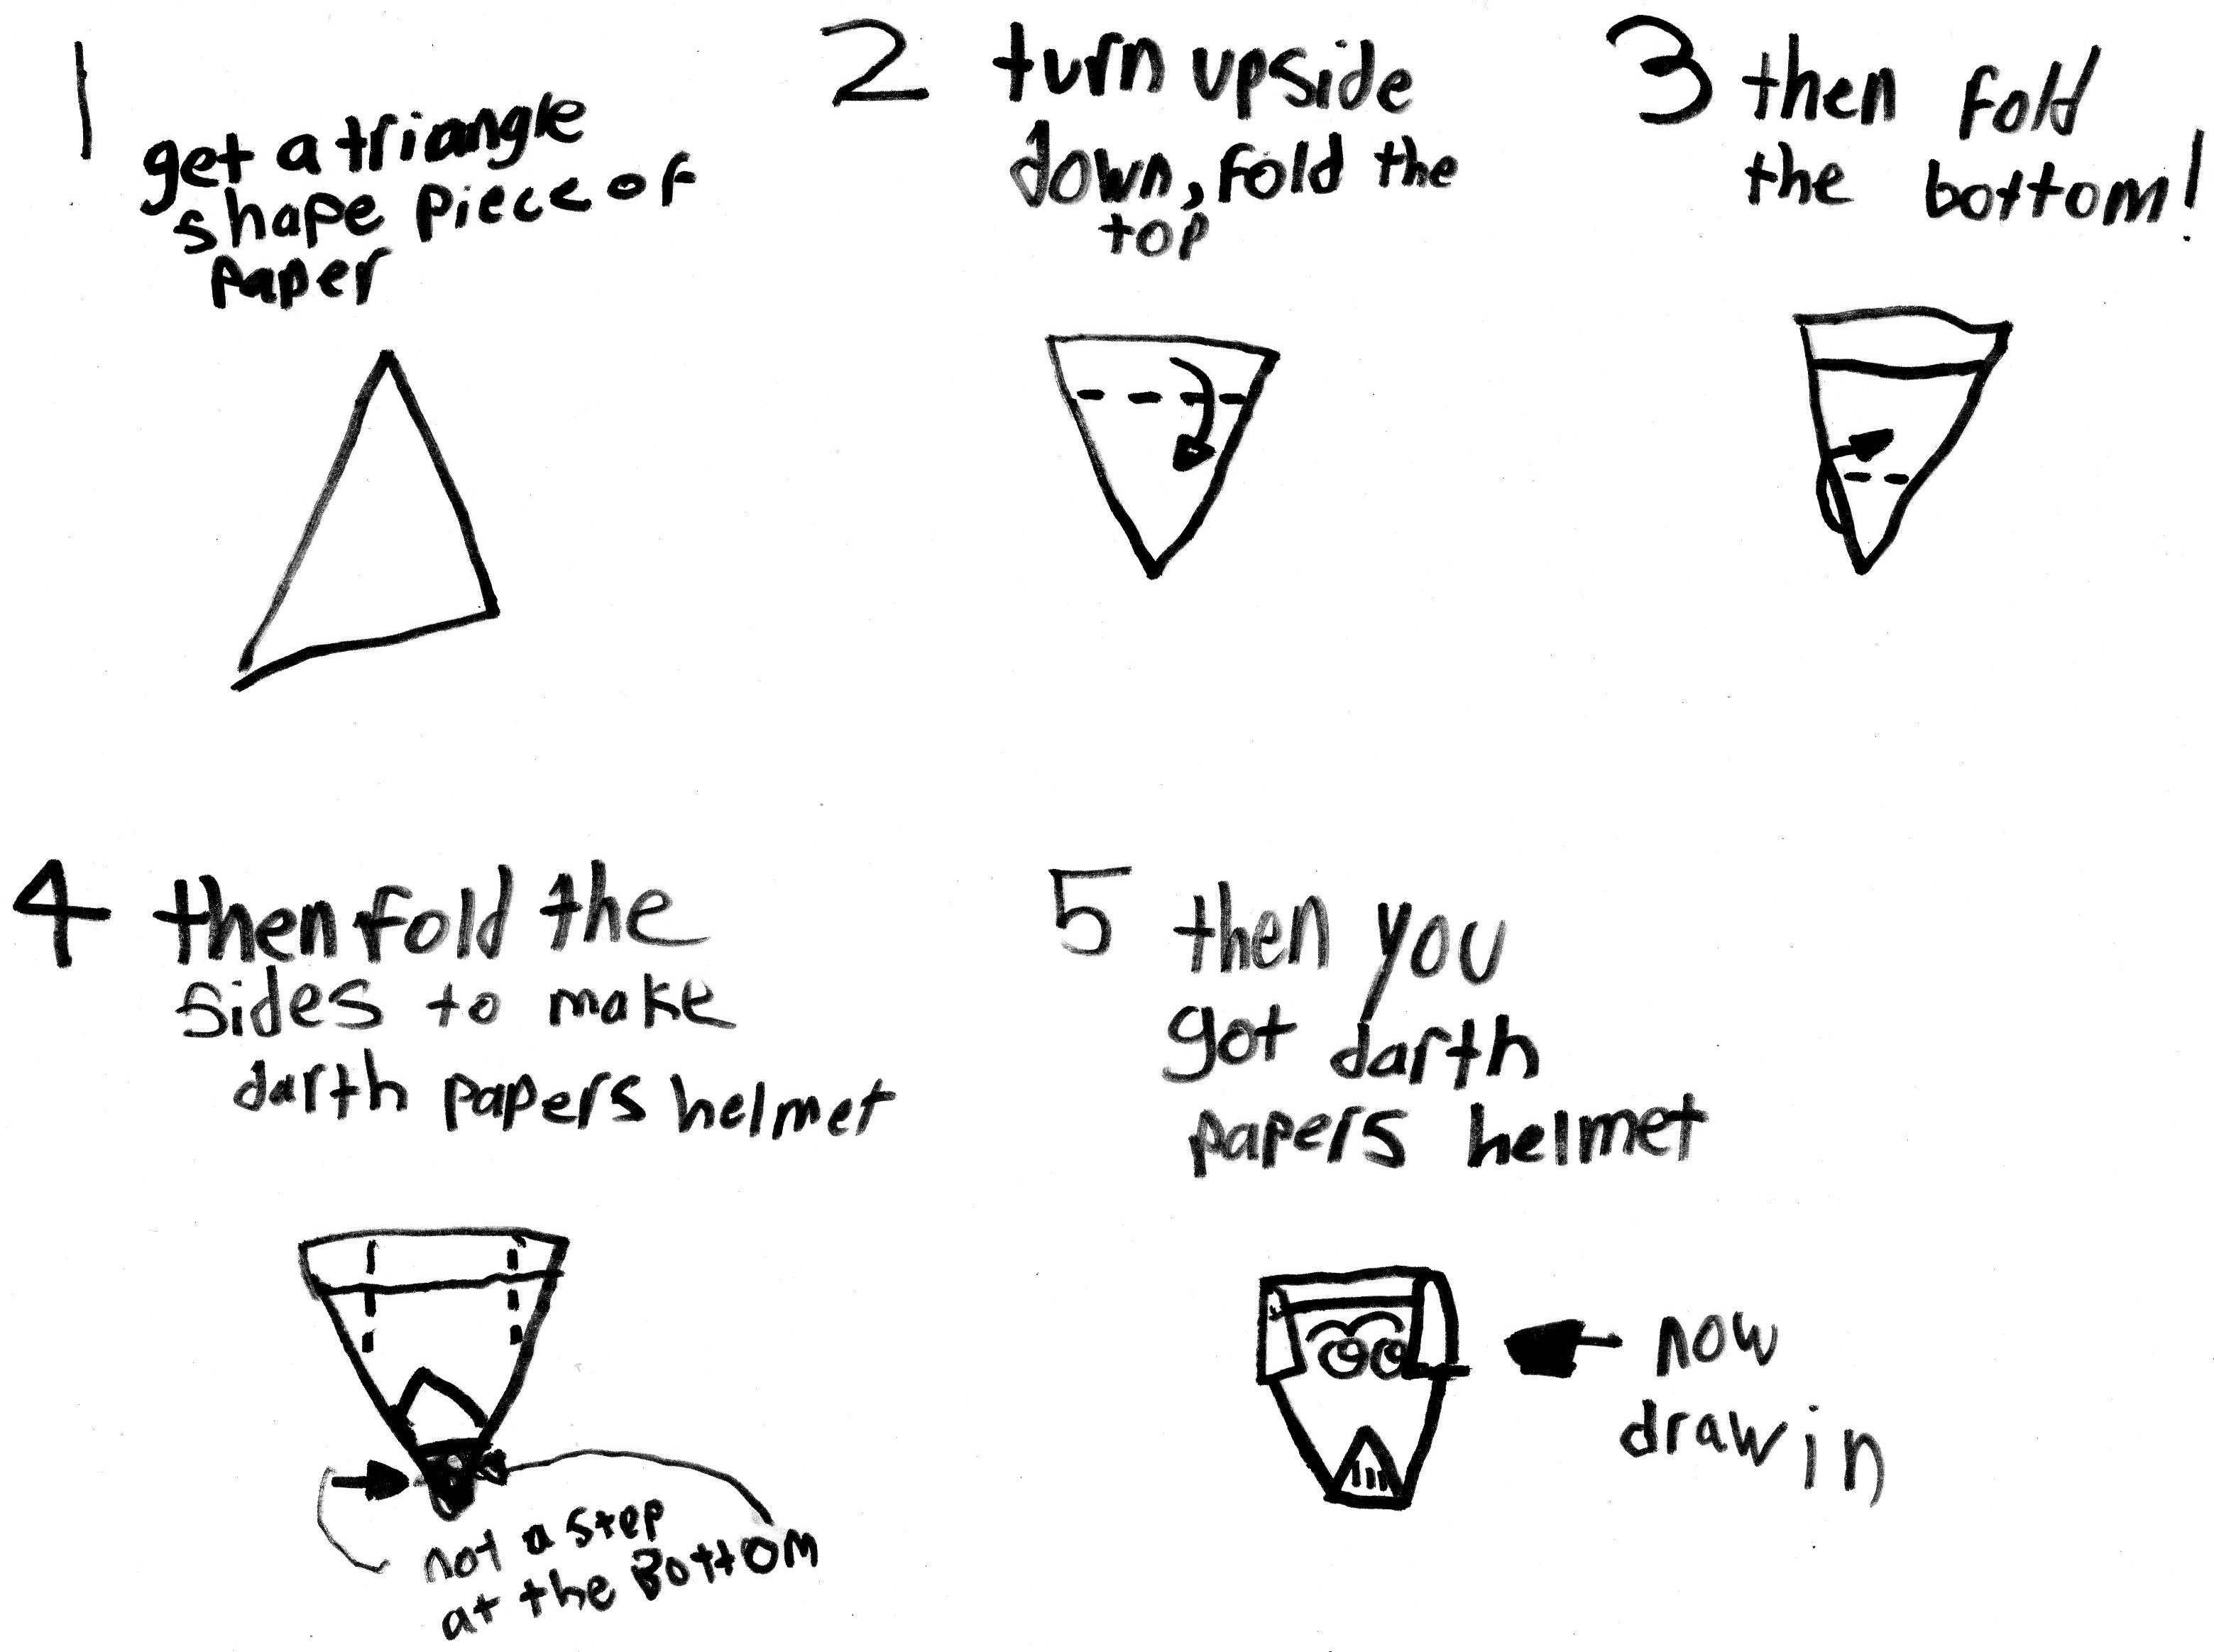 Darth Papers Helmet Instructions